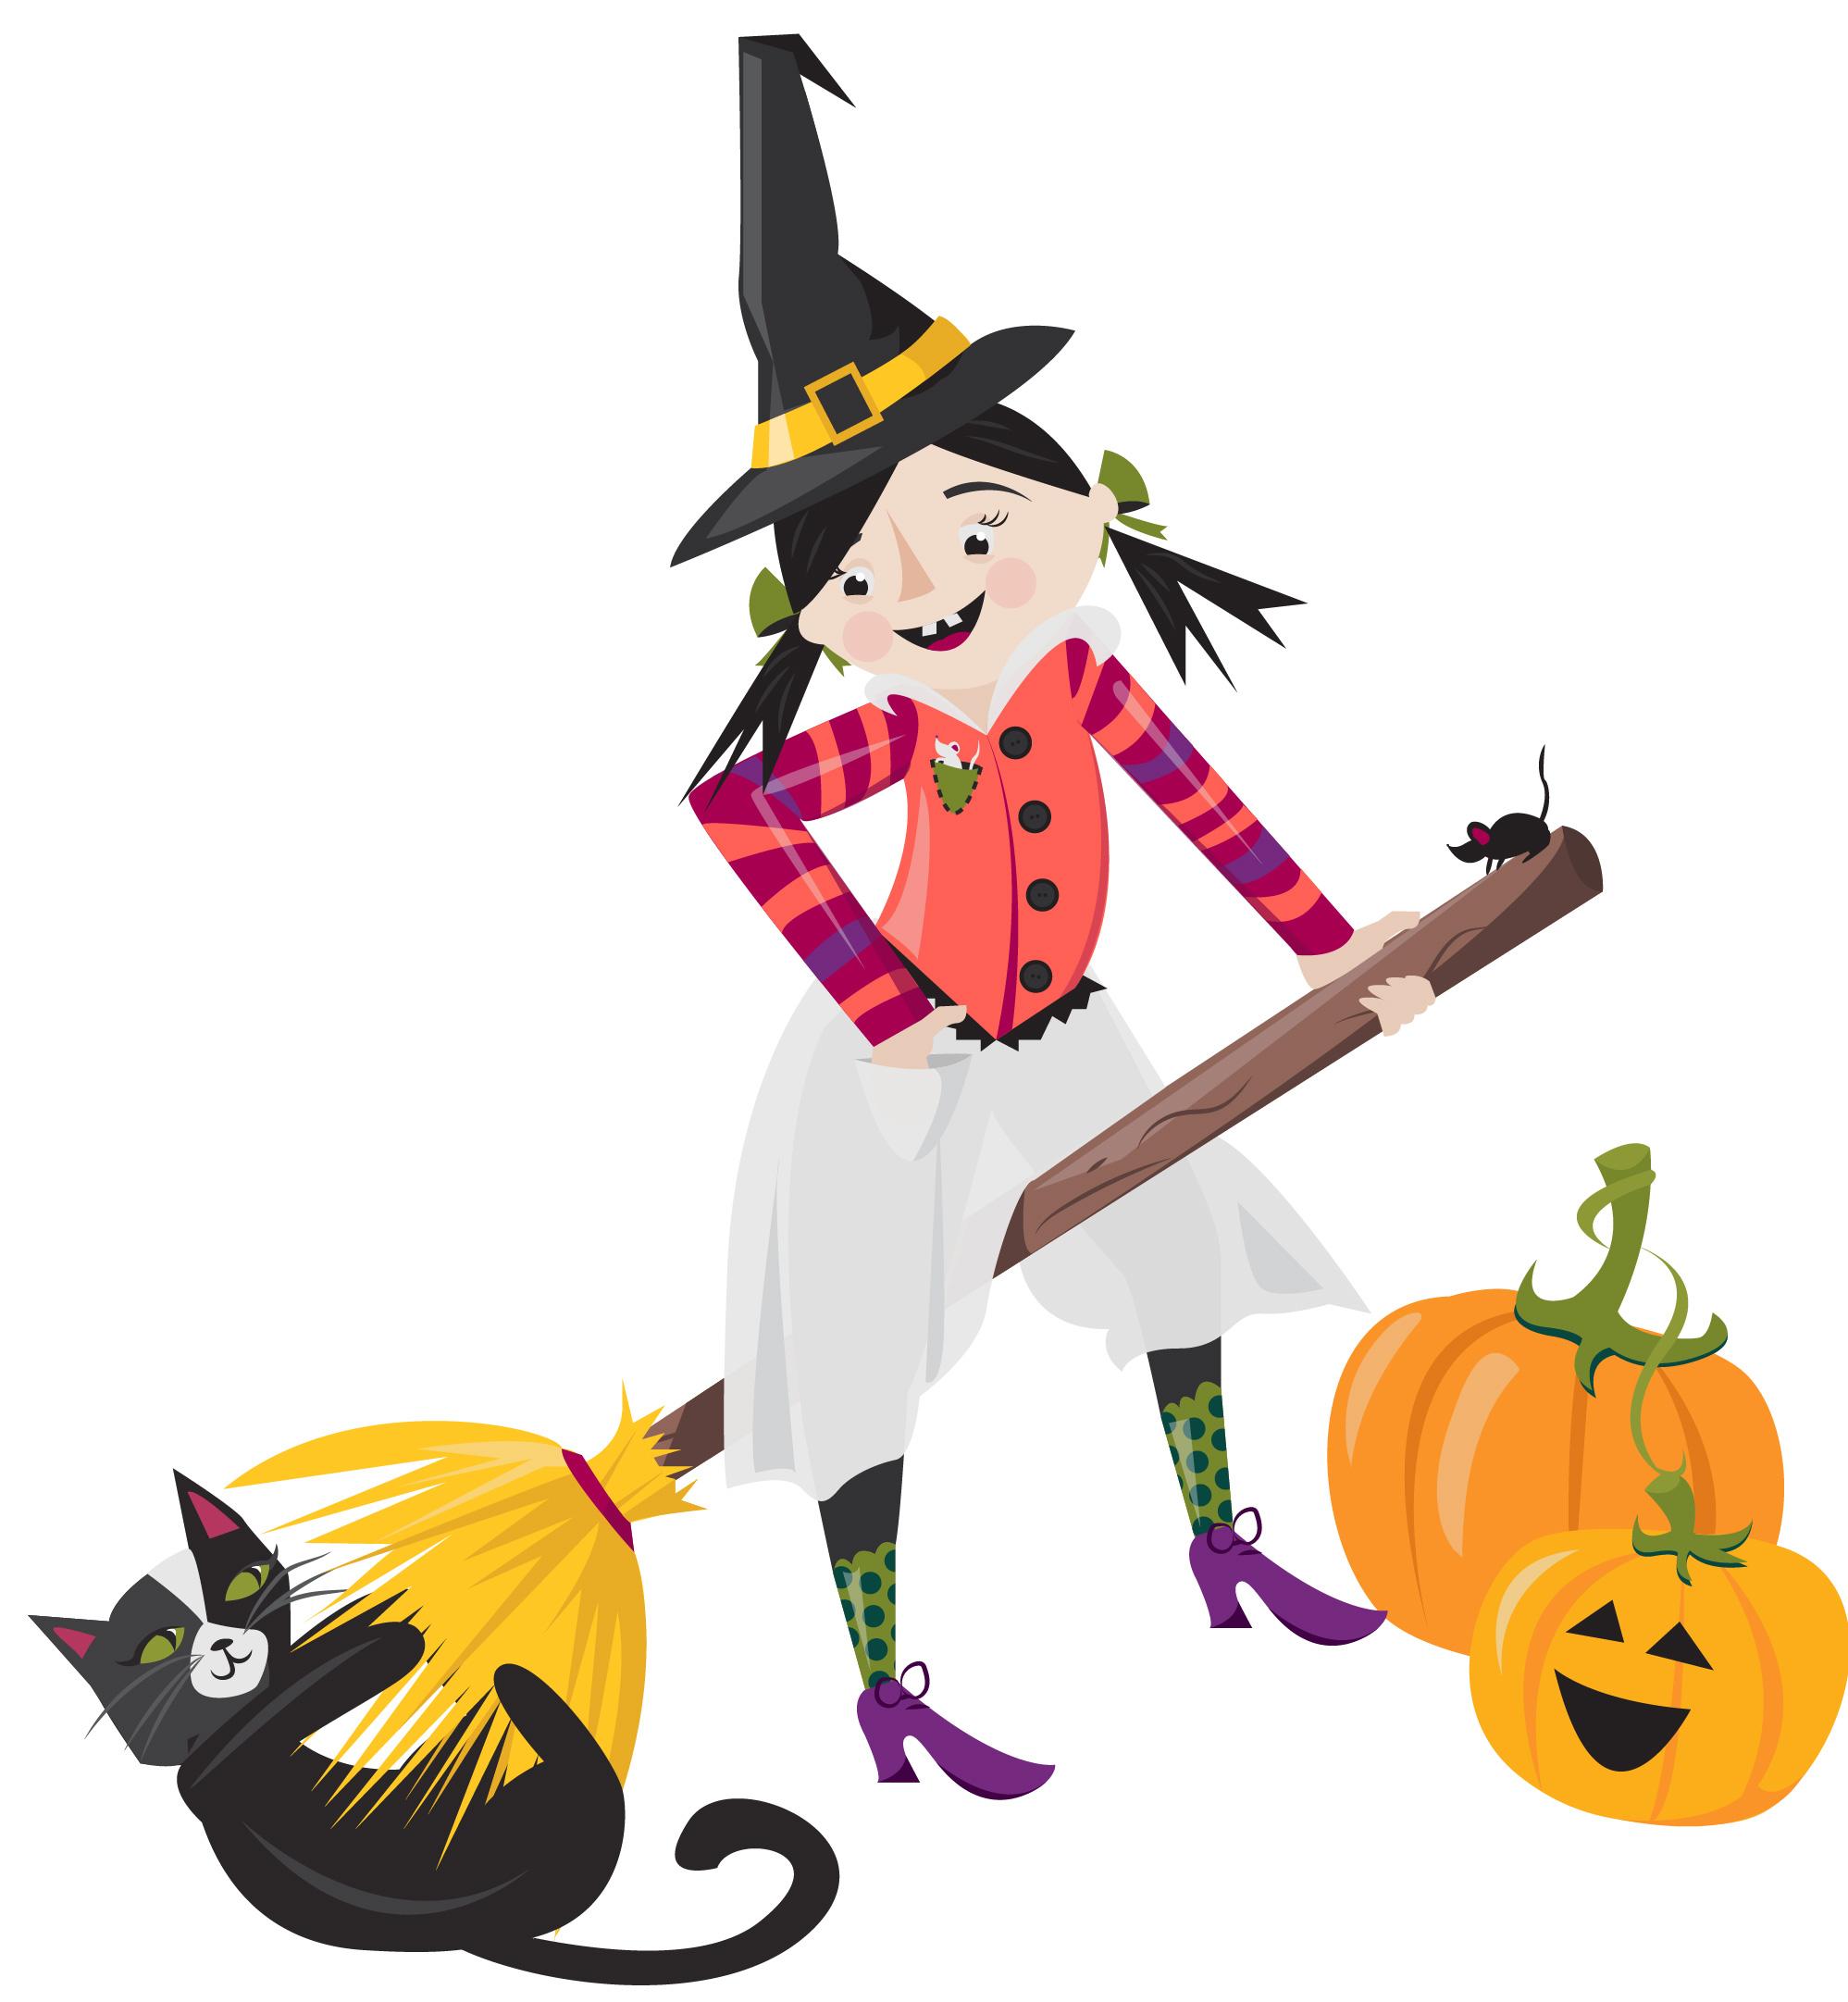 Witch girl 1-01.jpg